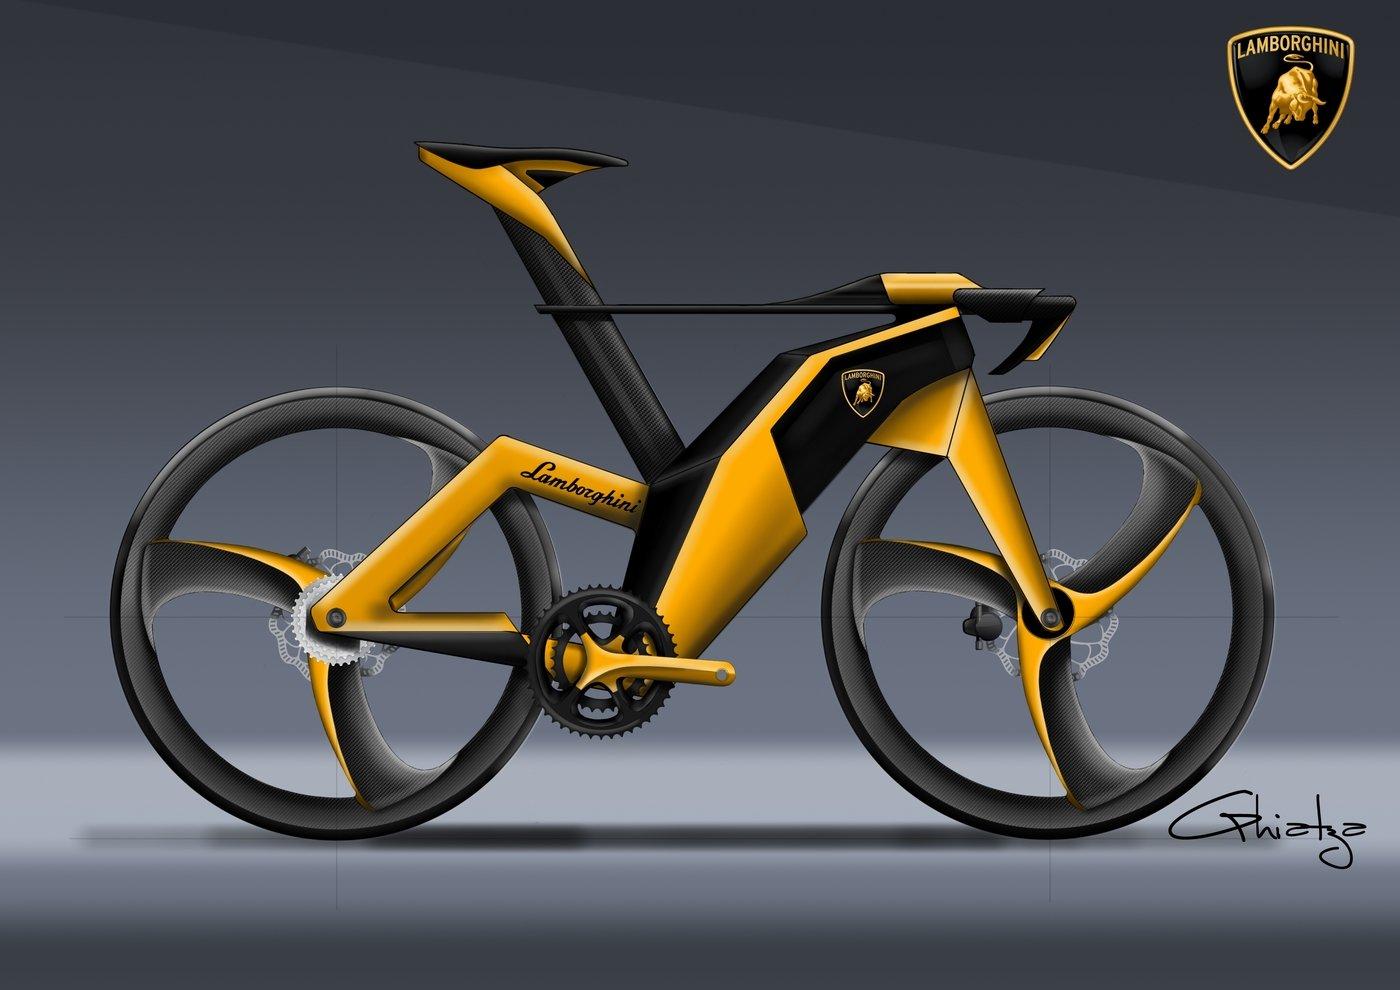 Lamborghini Concept Bike Premium By Mikael Ghiatza At Coroflot Com